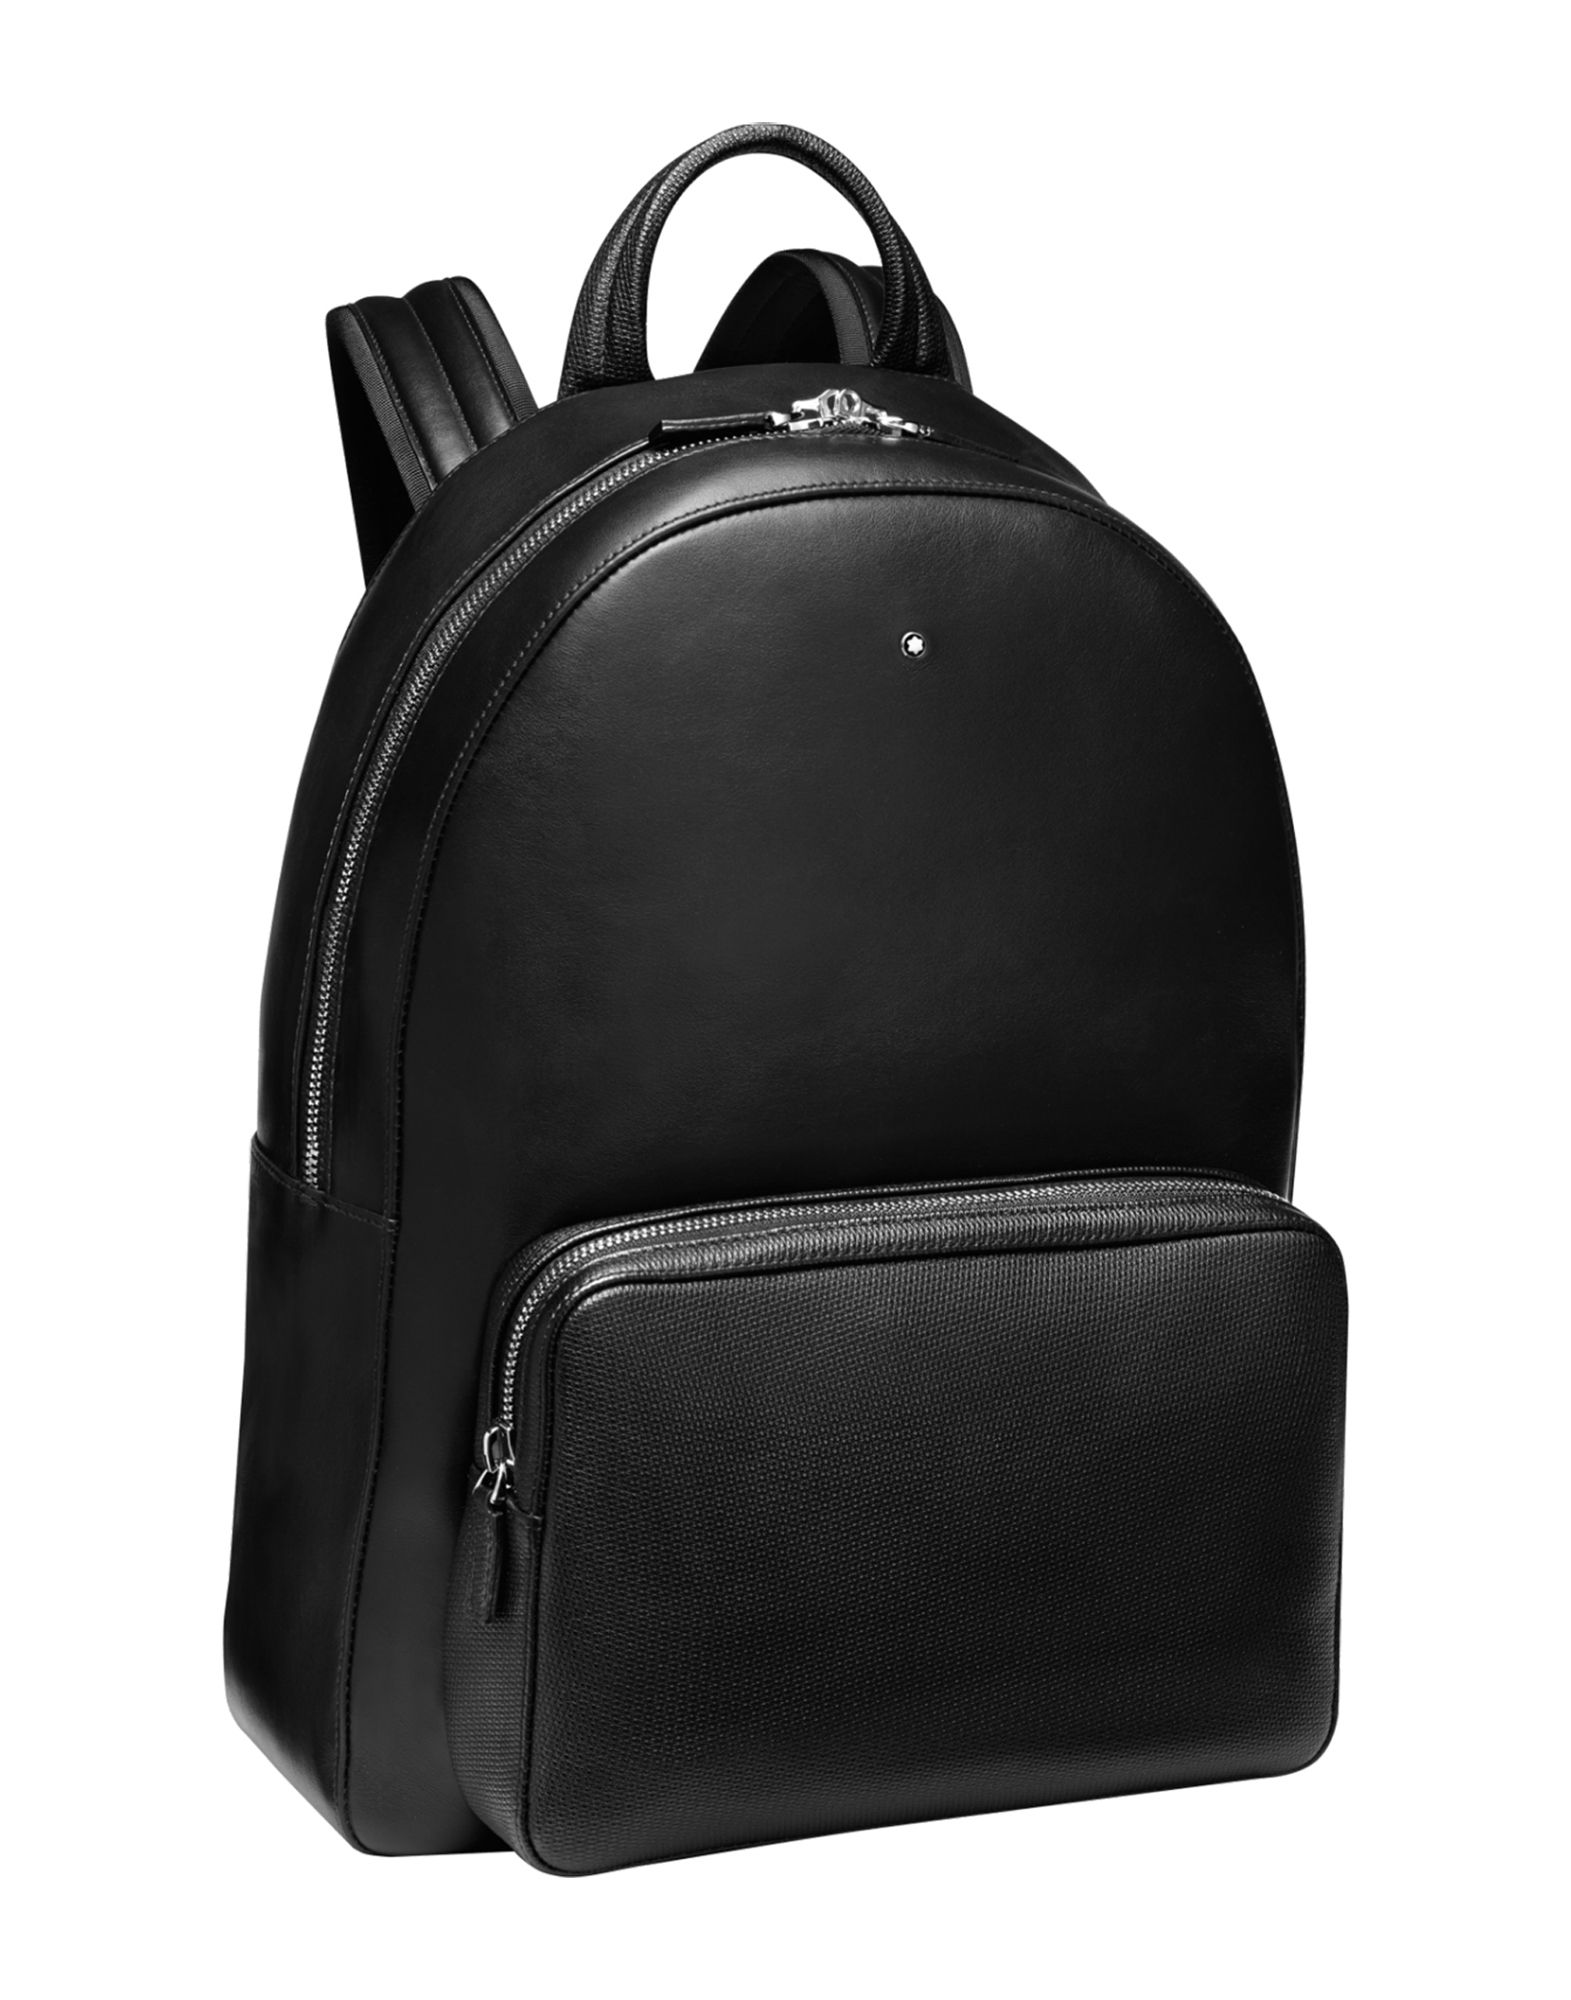 Zaini & Marsupi Montblanc Unicef_Backpack - Uomo - Acquista online su